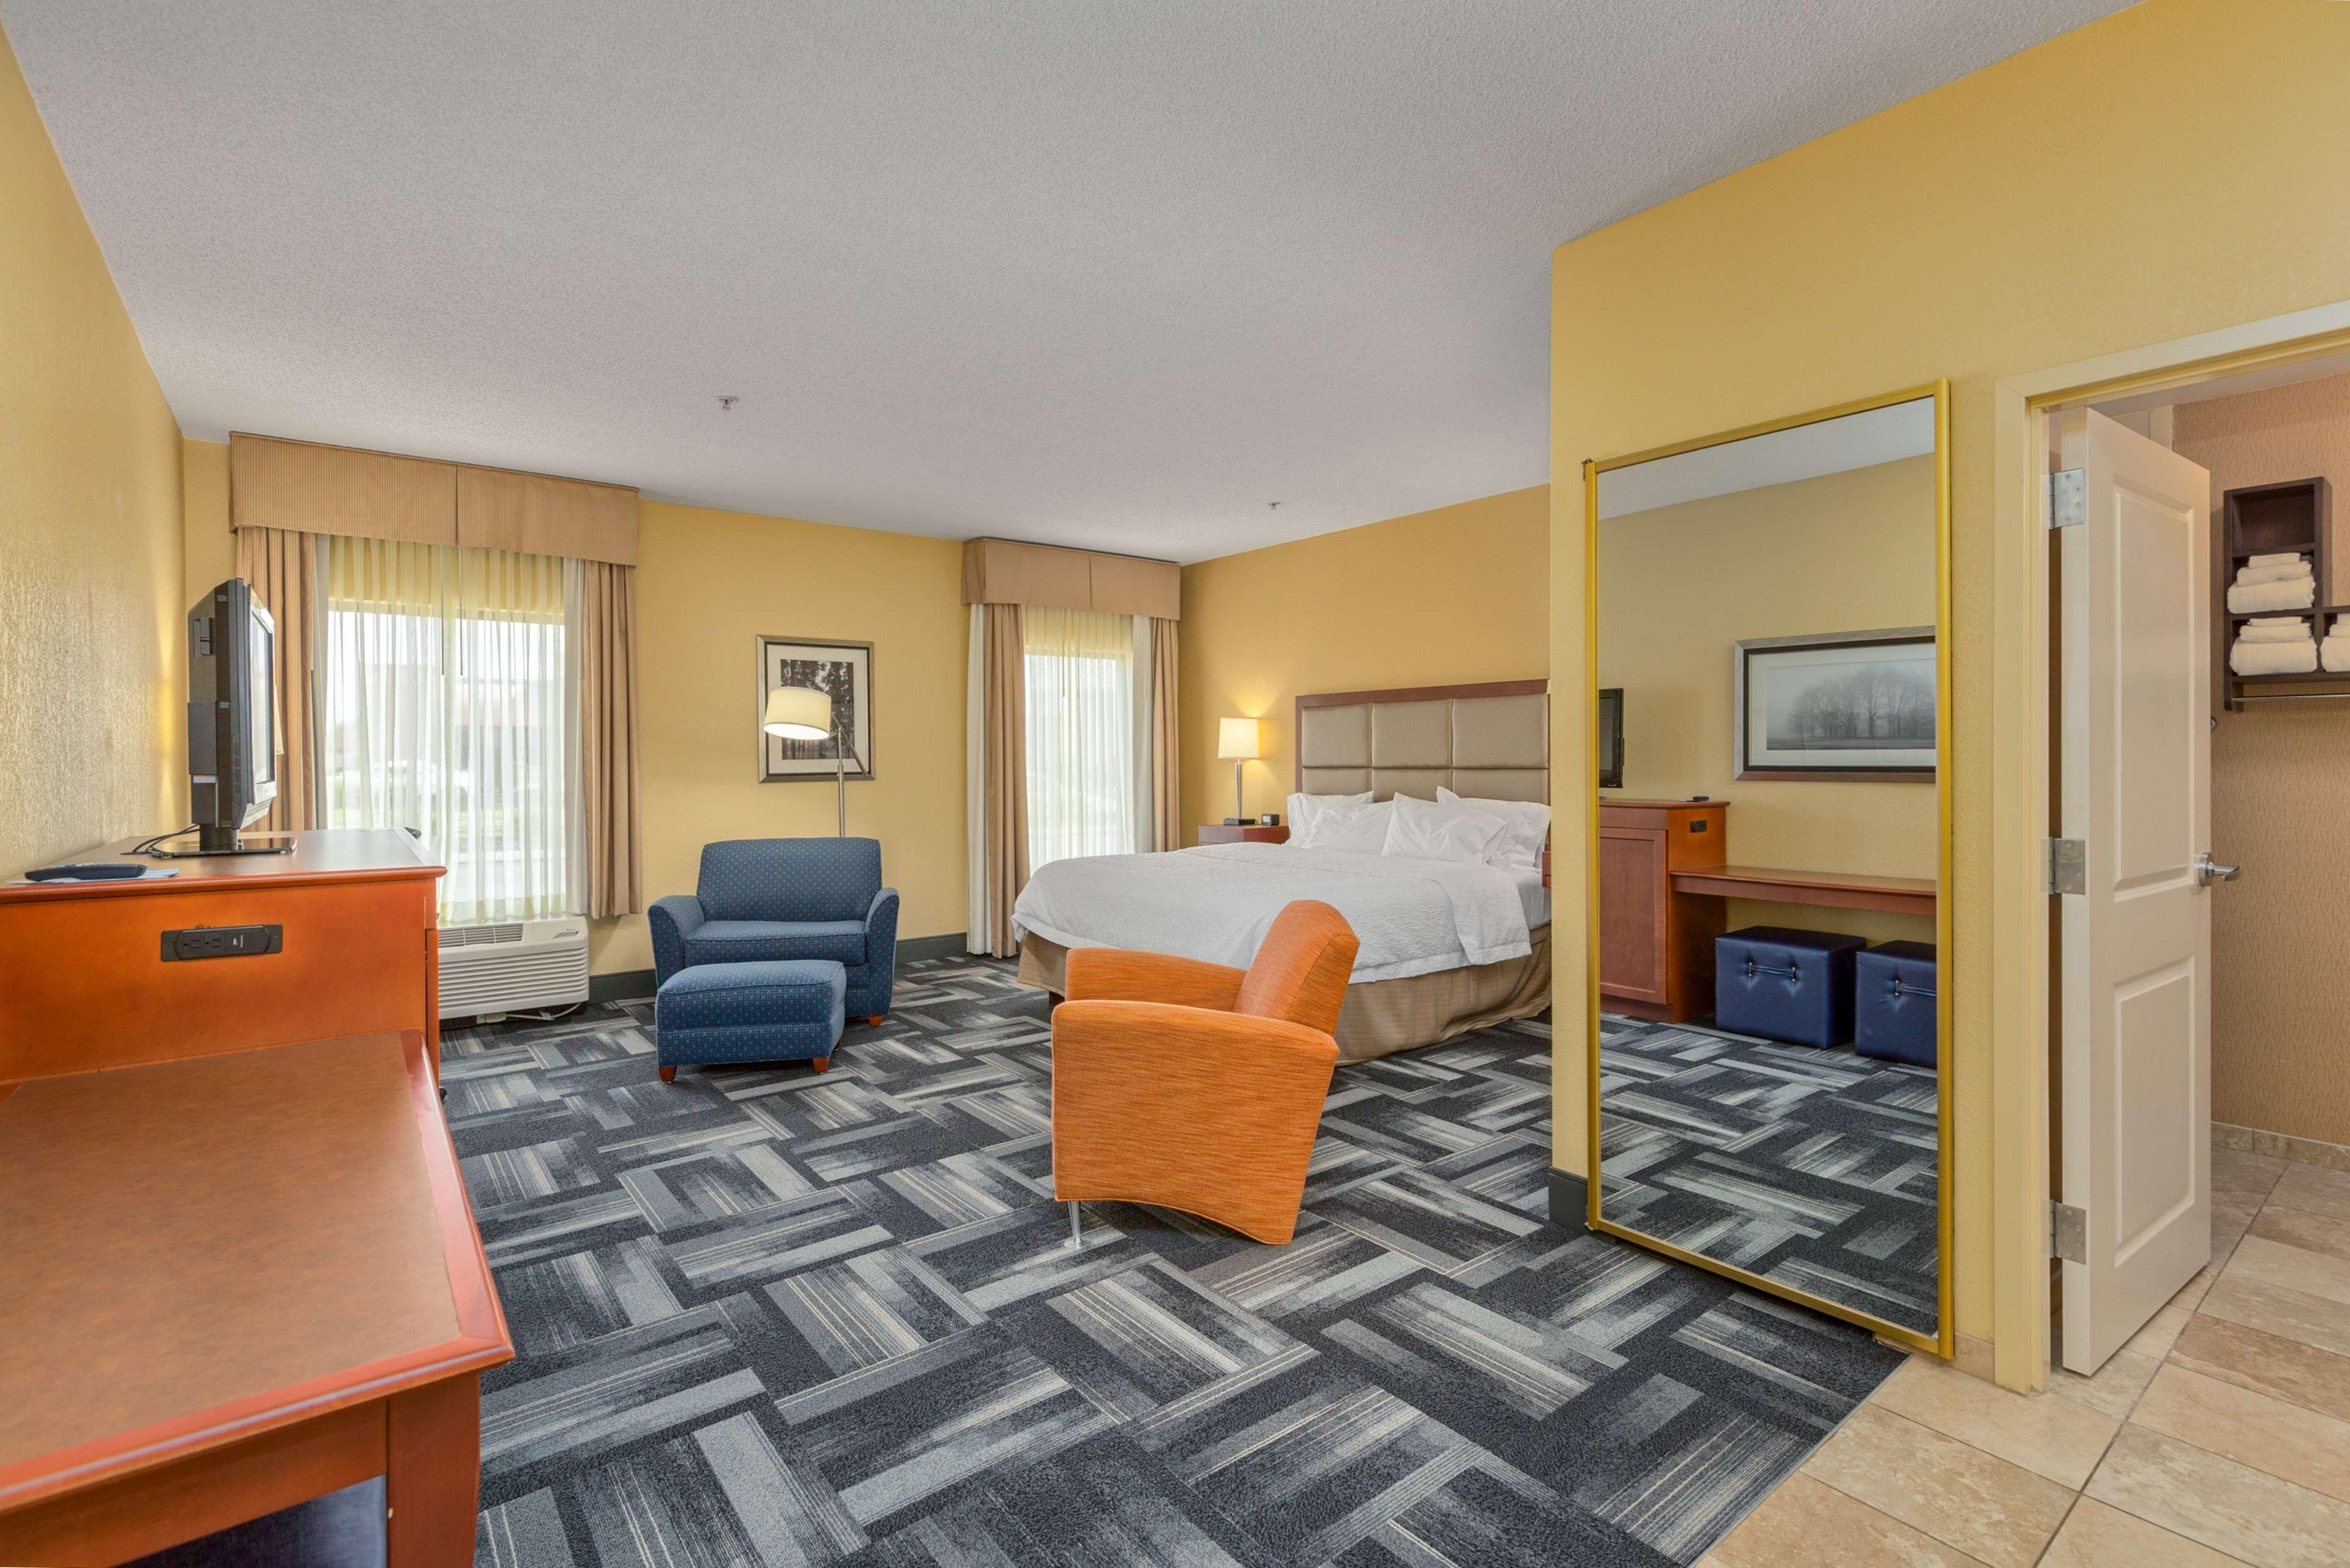 hampton inn owensboro south owensboro ky hamptoninn3. Black Bedroom Furniture Sets. Home Design Ideas